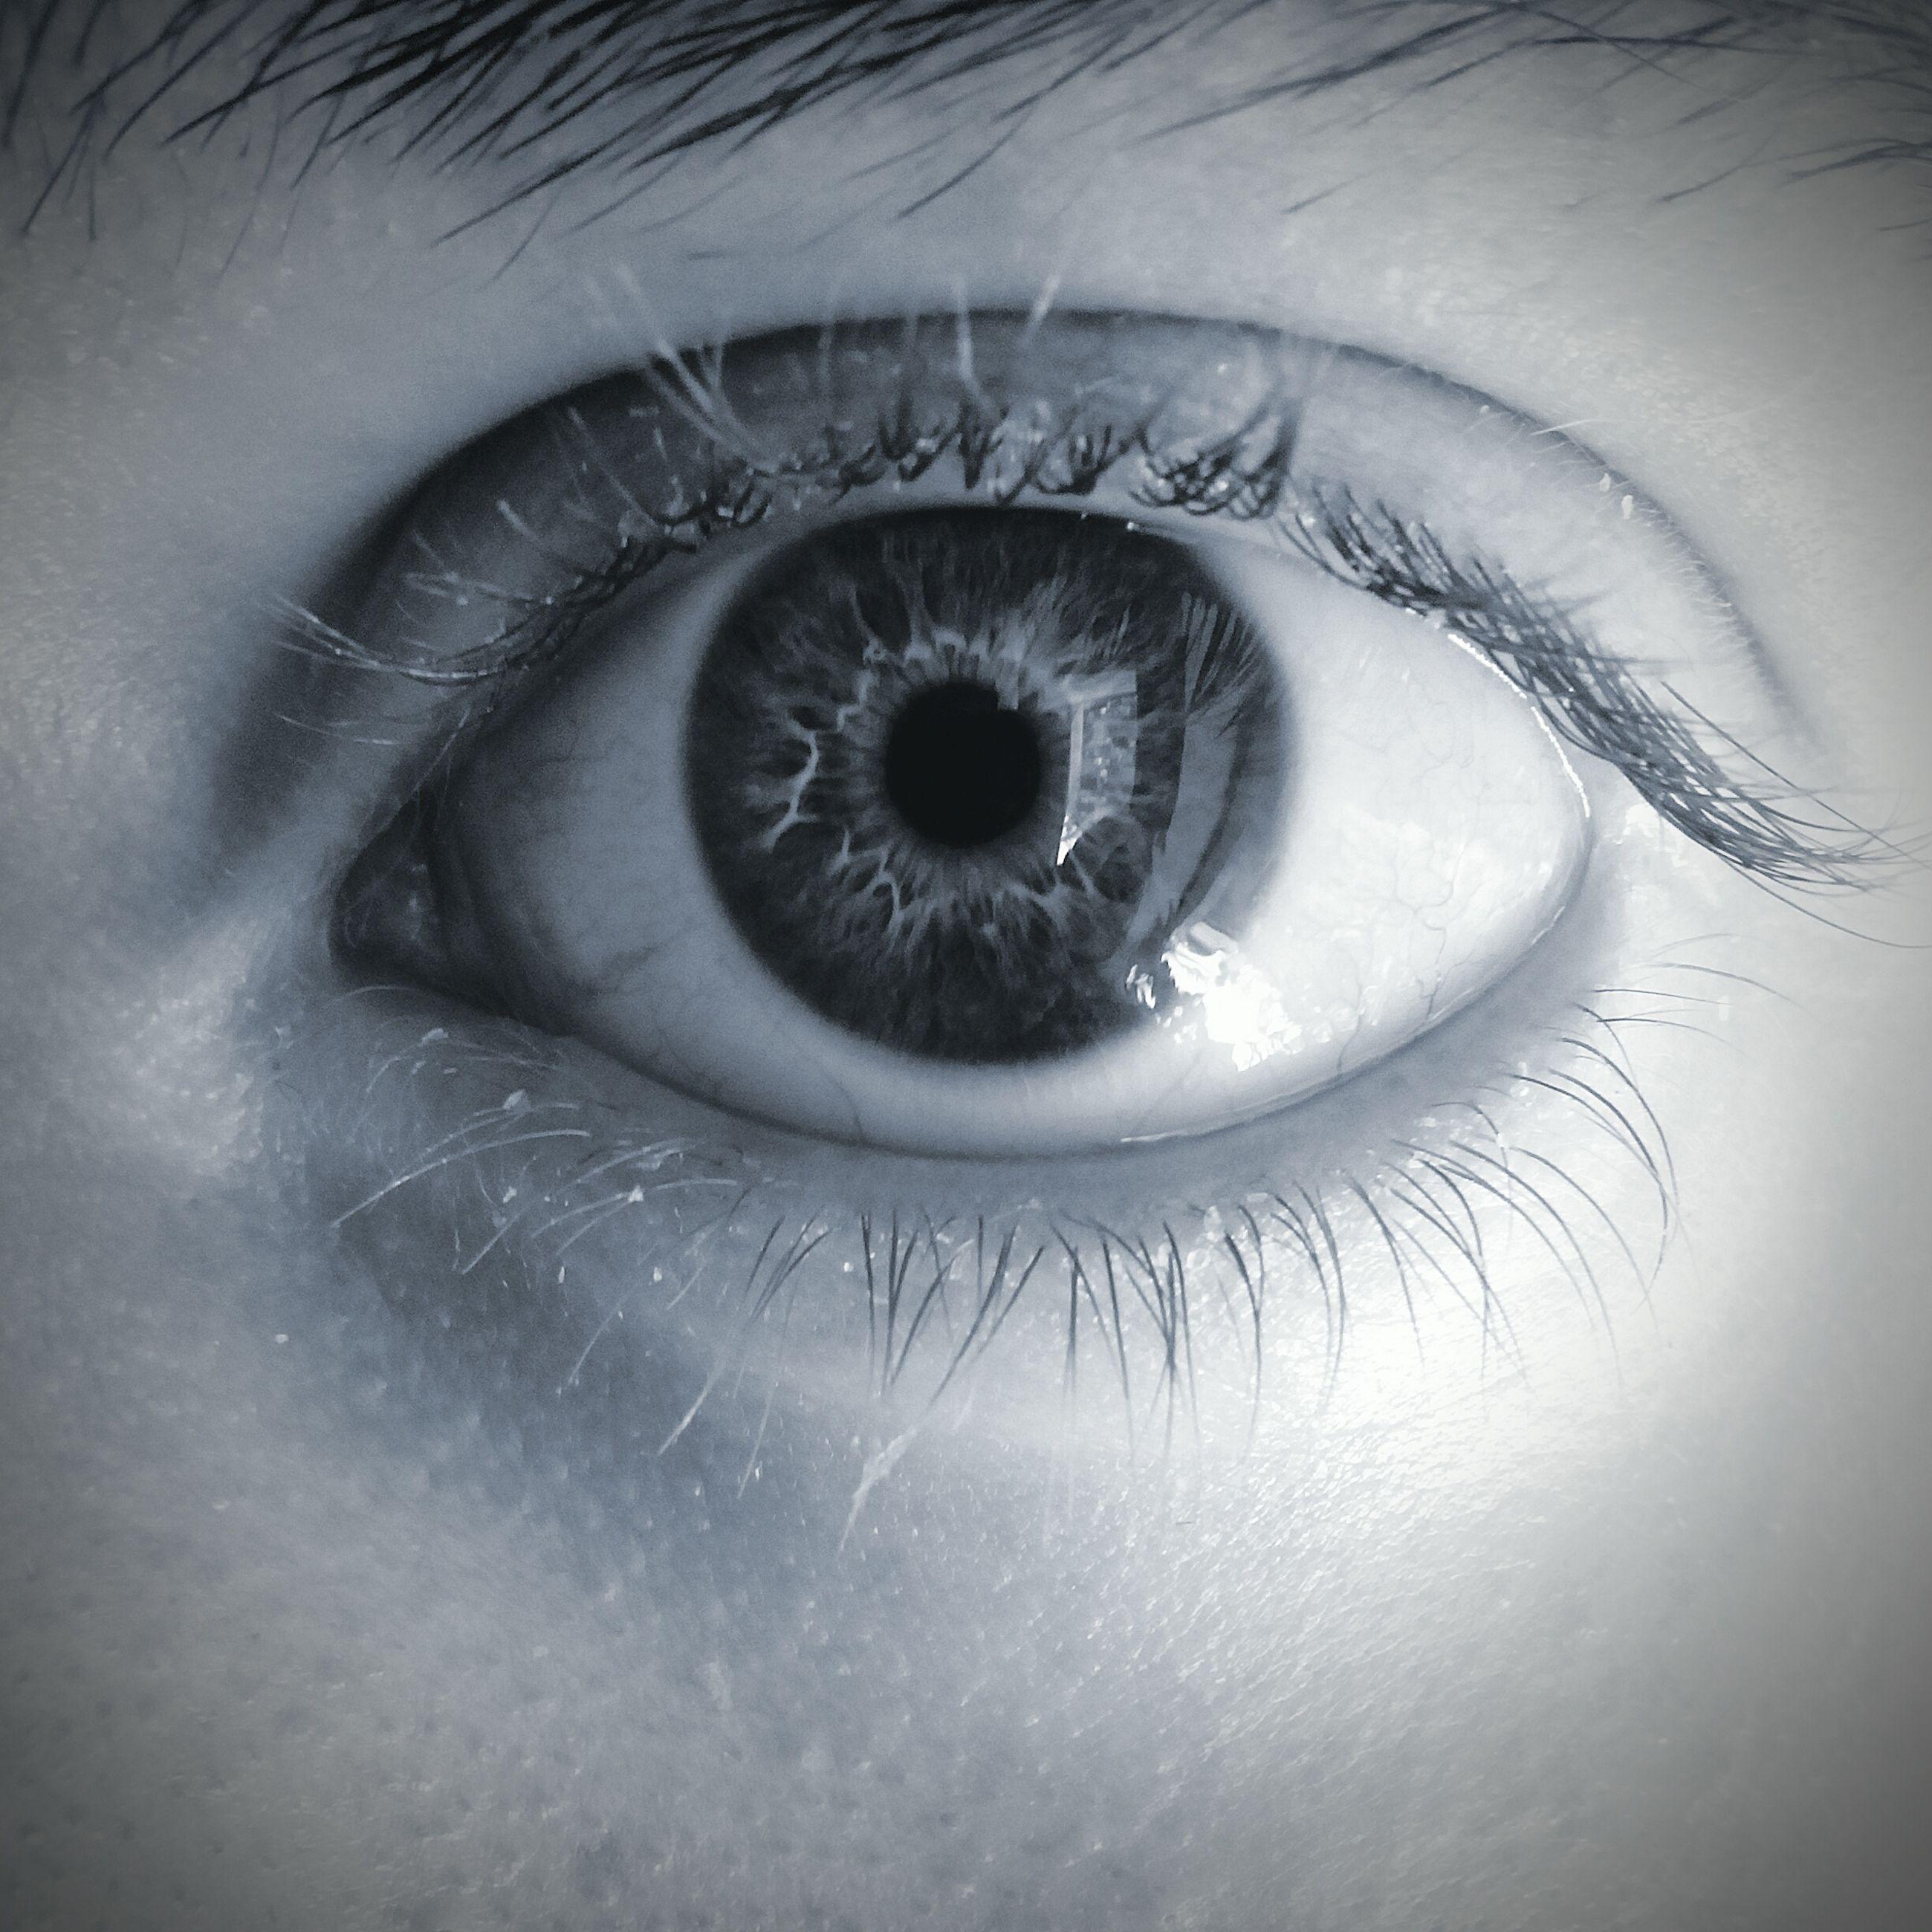 indoors, human eye, eyesight, close-up, eyelash, looking at camera, sensory perception, portrait, extreme close-up, part of, iris - eye, studio shot, eyeball, human skin, full frame, reflection, human face